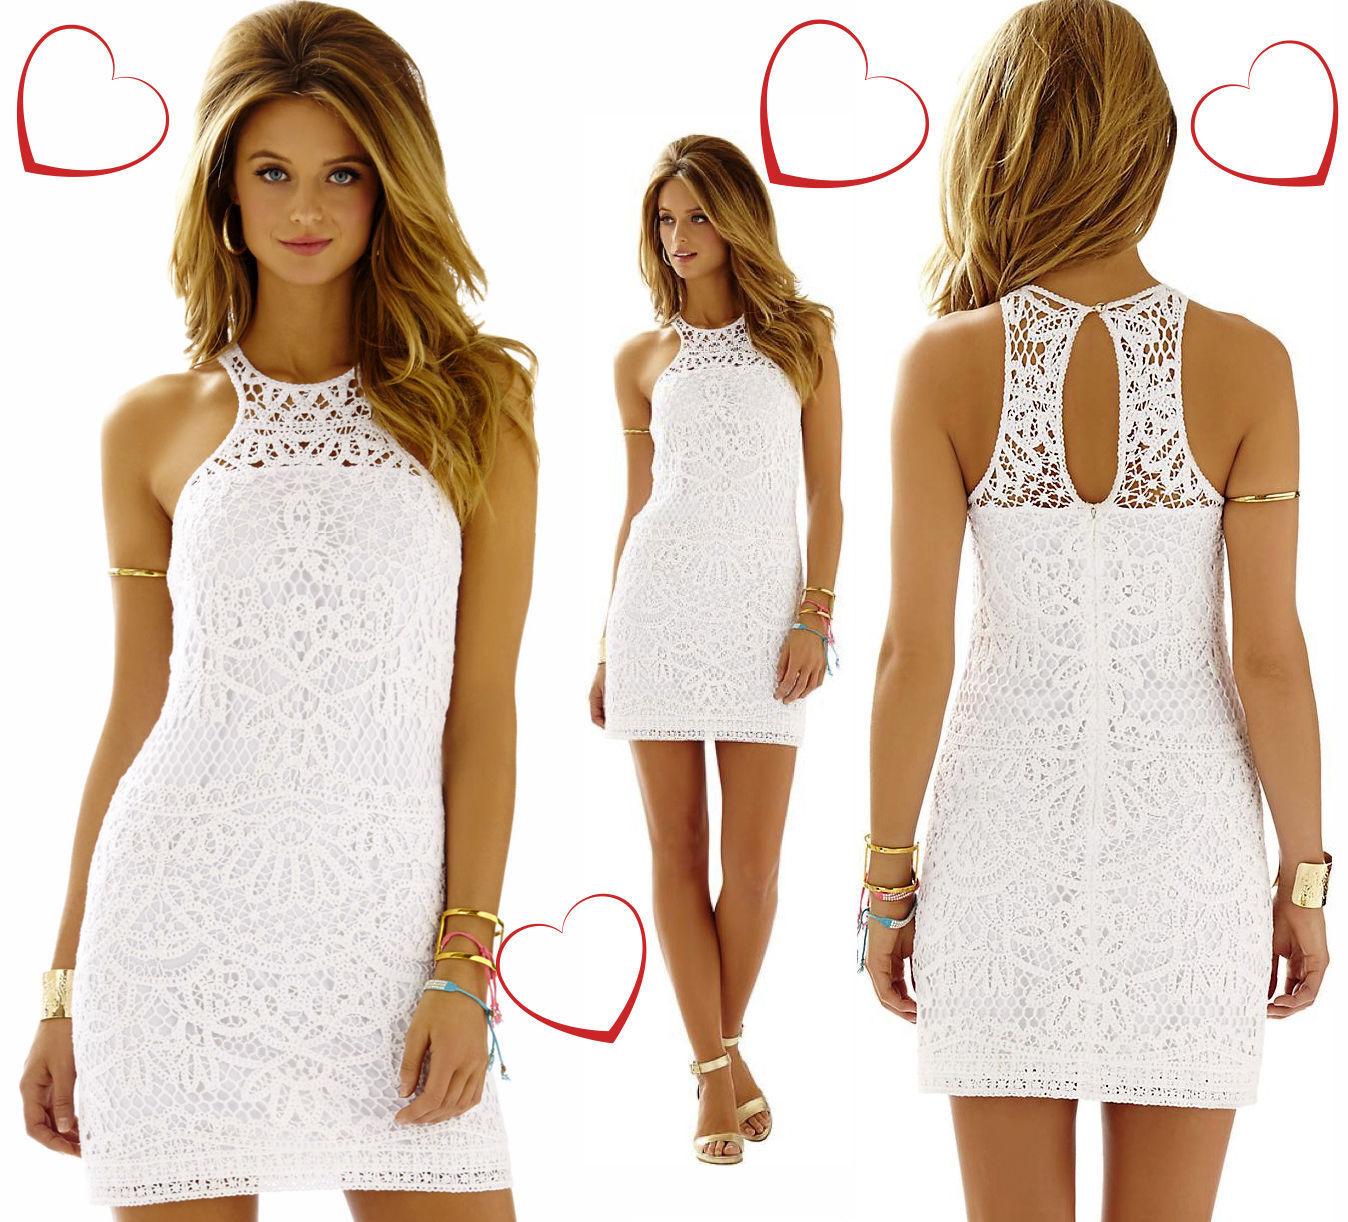 248 Lilly Pulitzer Jaimie Resort White Dress XS S M L 63837e